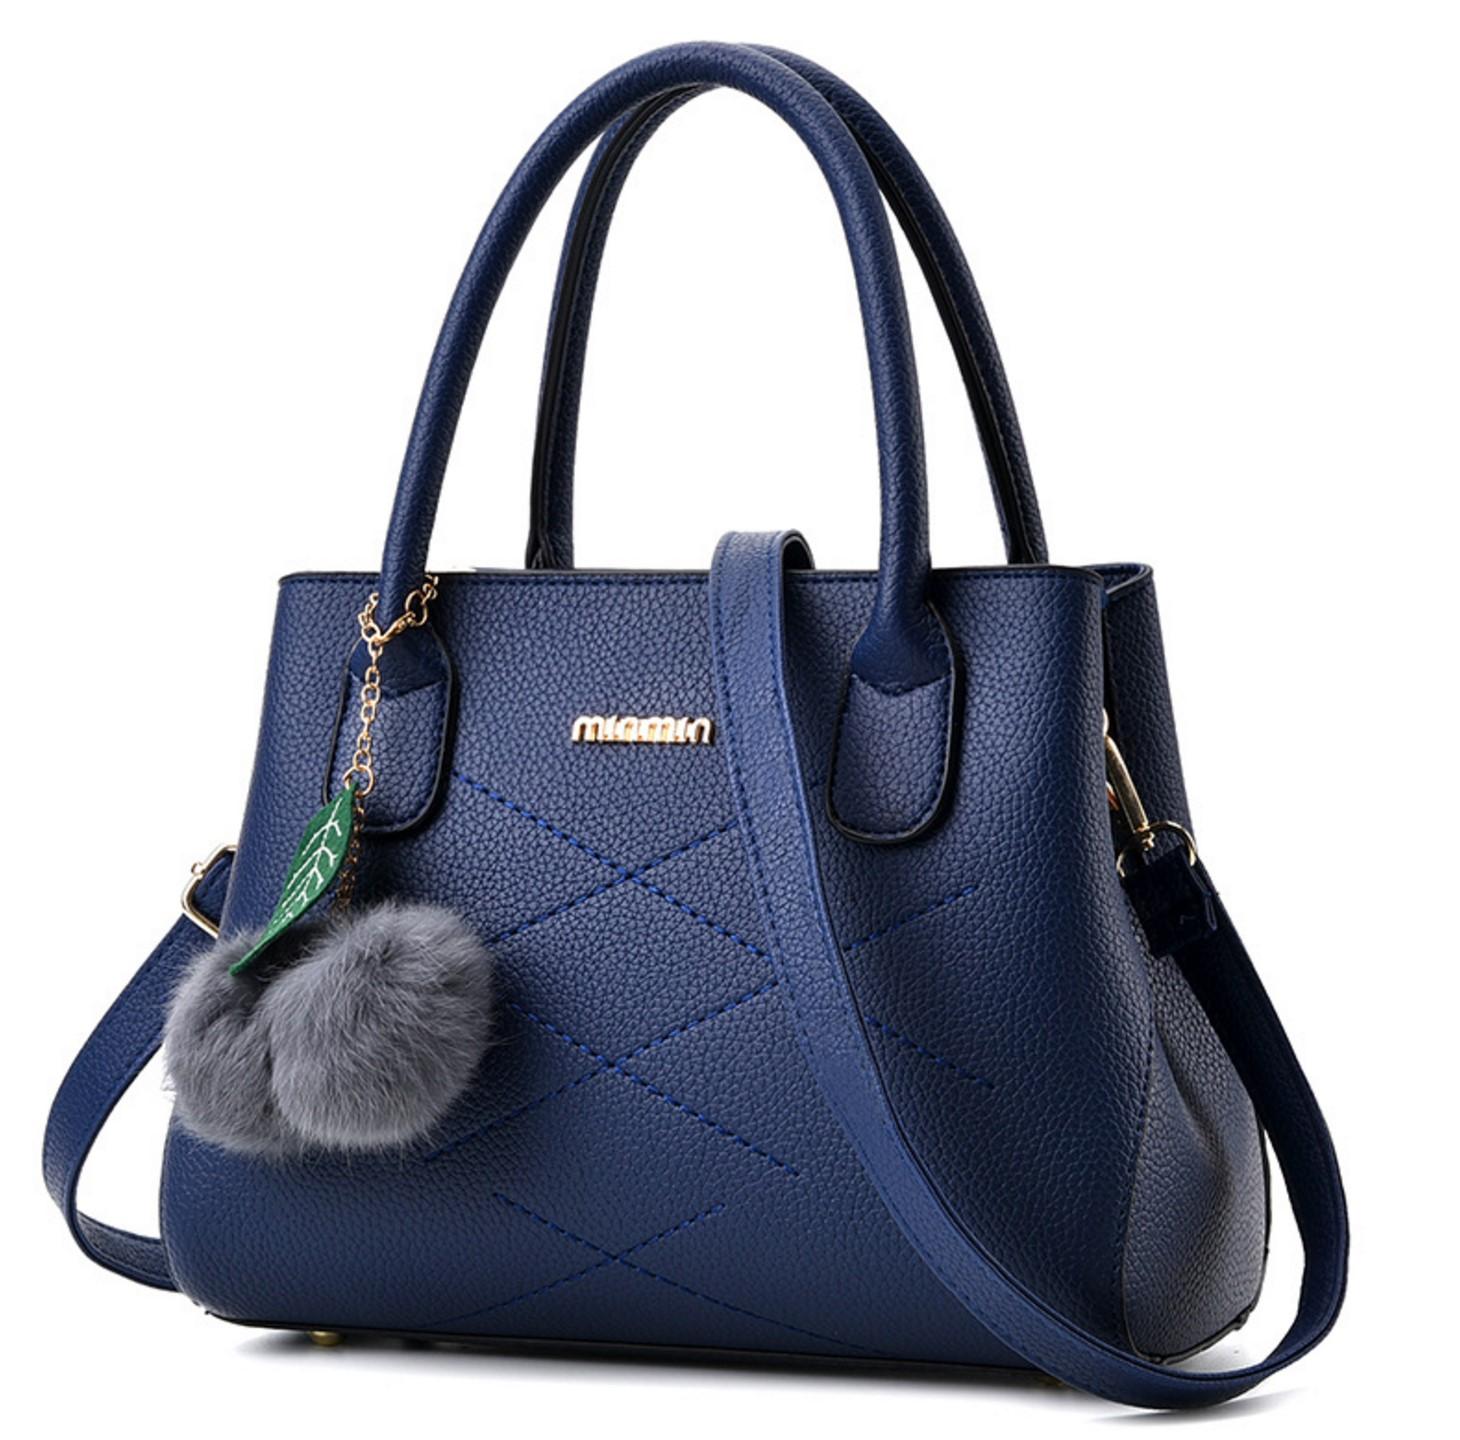 553159331b465 Buy Wome Blue Leisure Shoulder Messenger Bag WB-13BL | Fashion | Business  Arcade